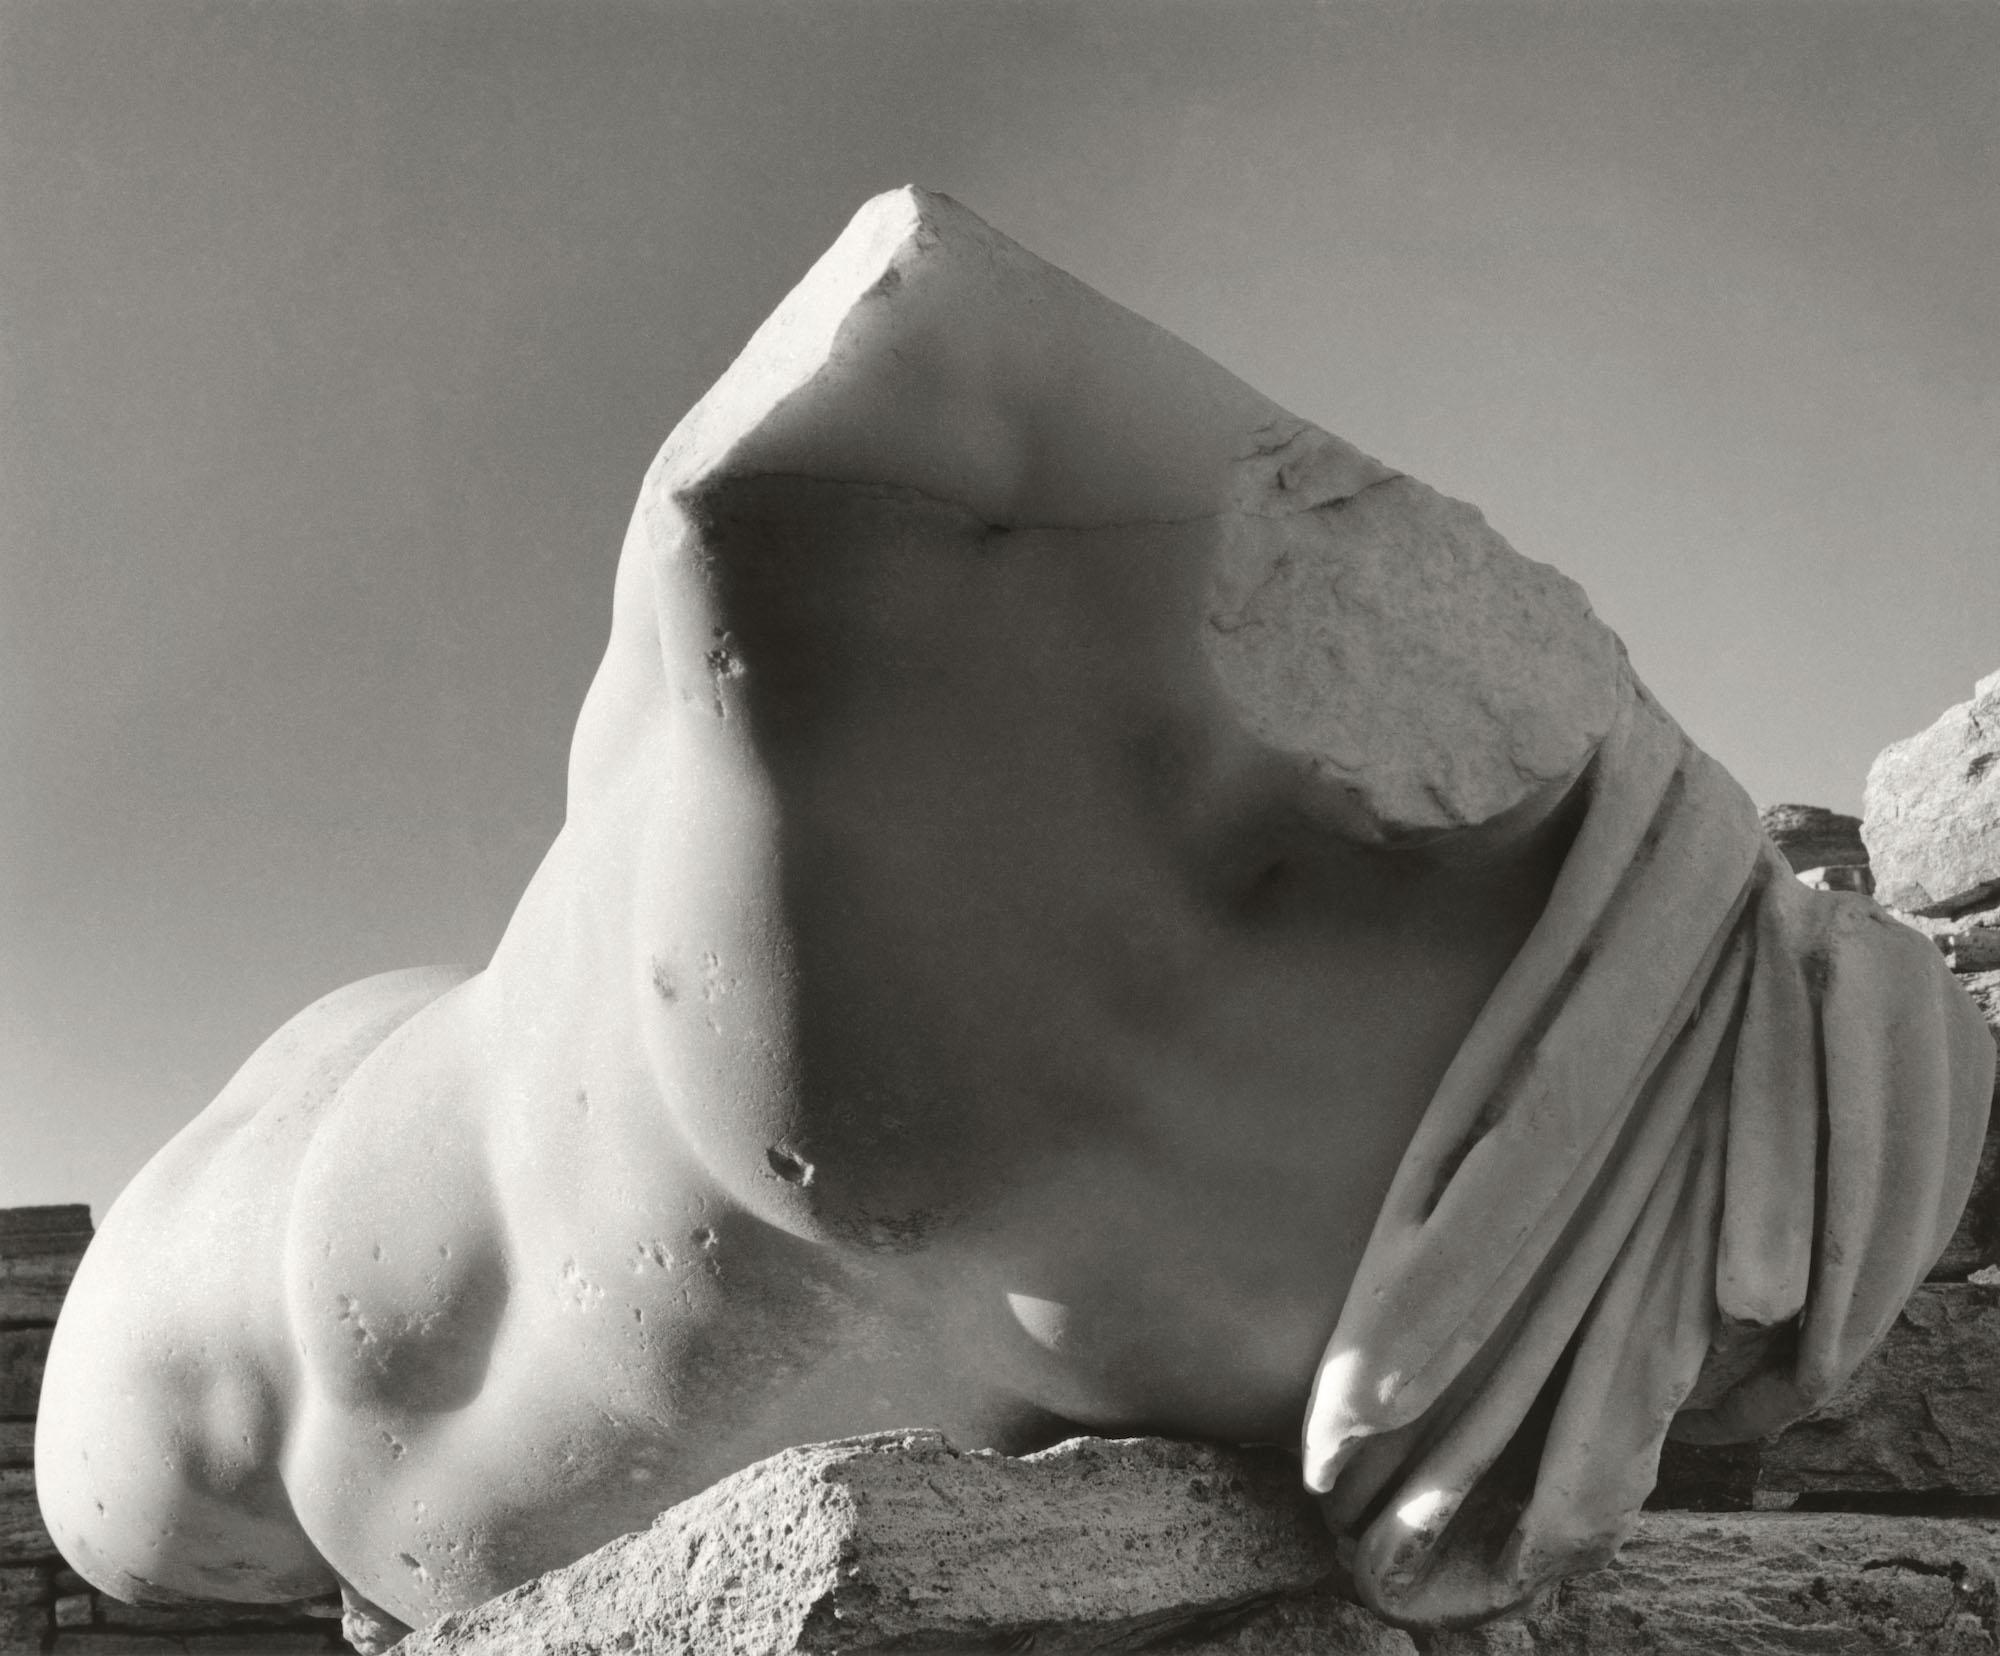 Greece, Cyclades, Island of Delos, Torso of Ophelius Ferus II © Herbert List / Magnum Photos